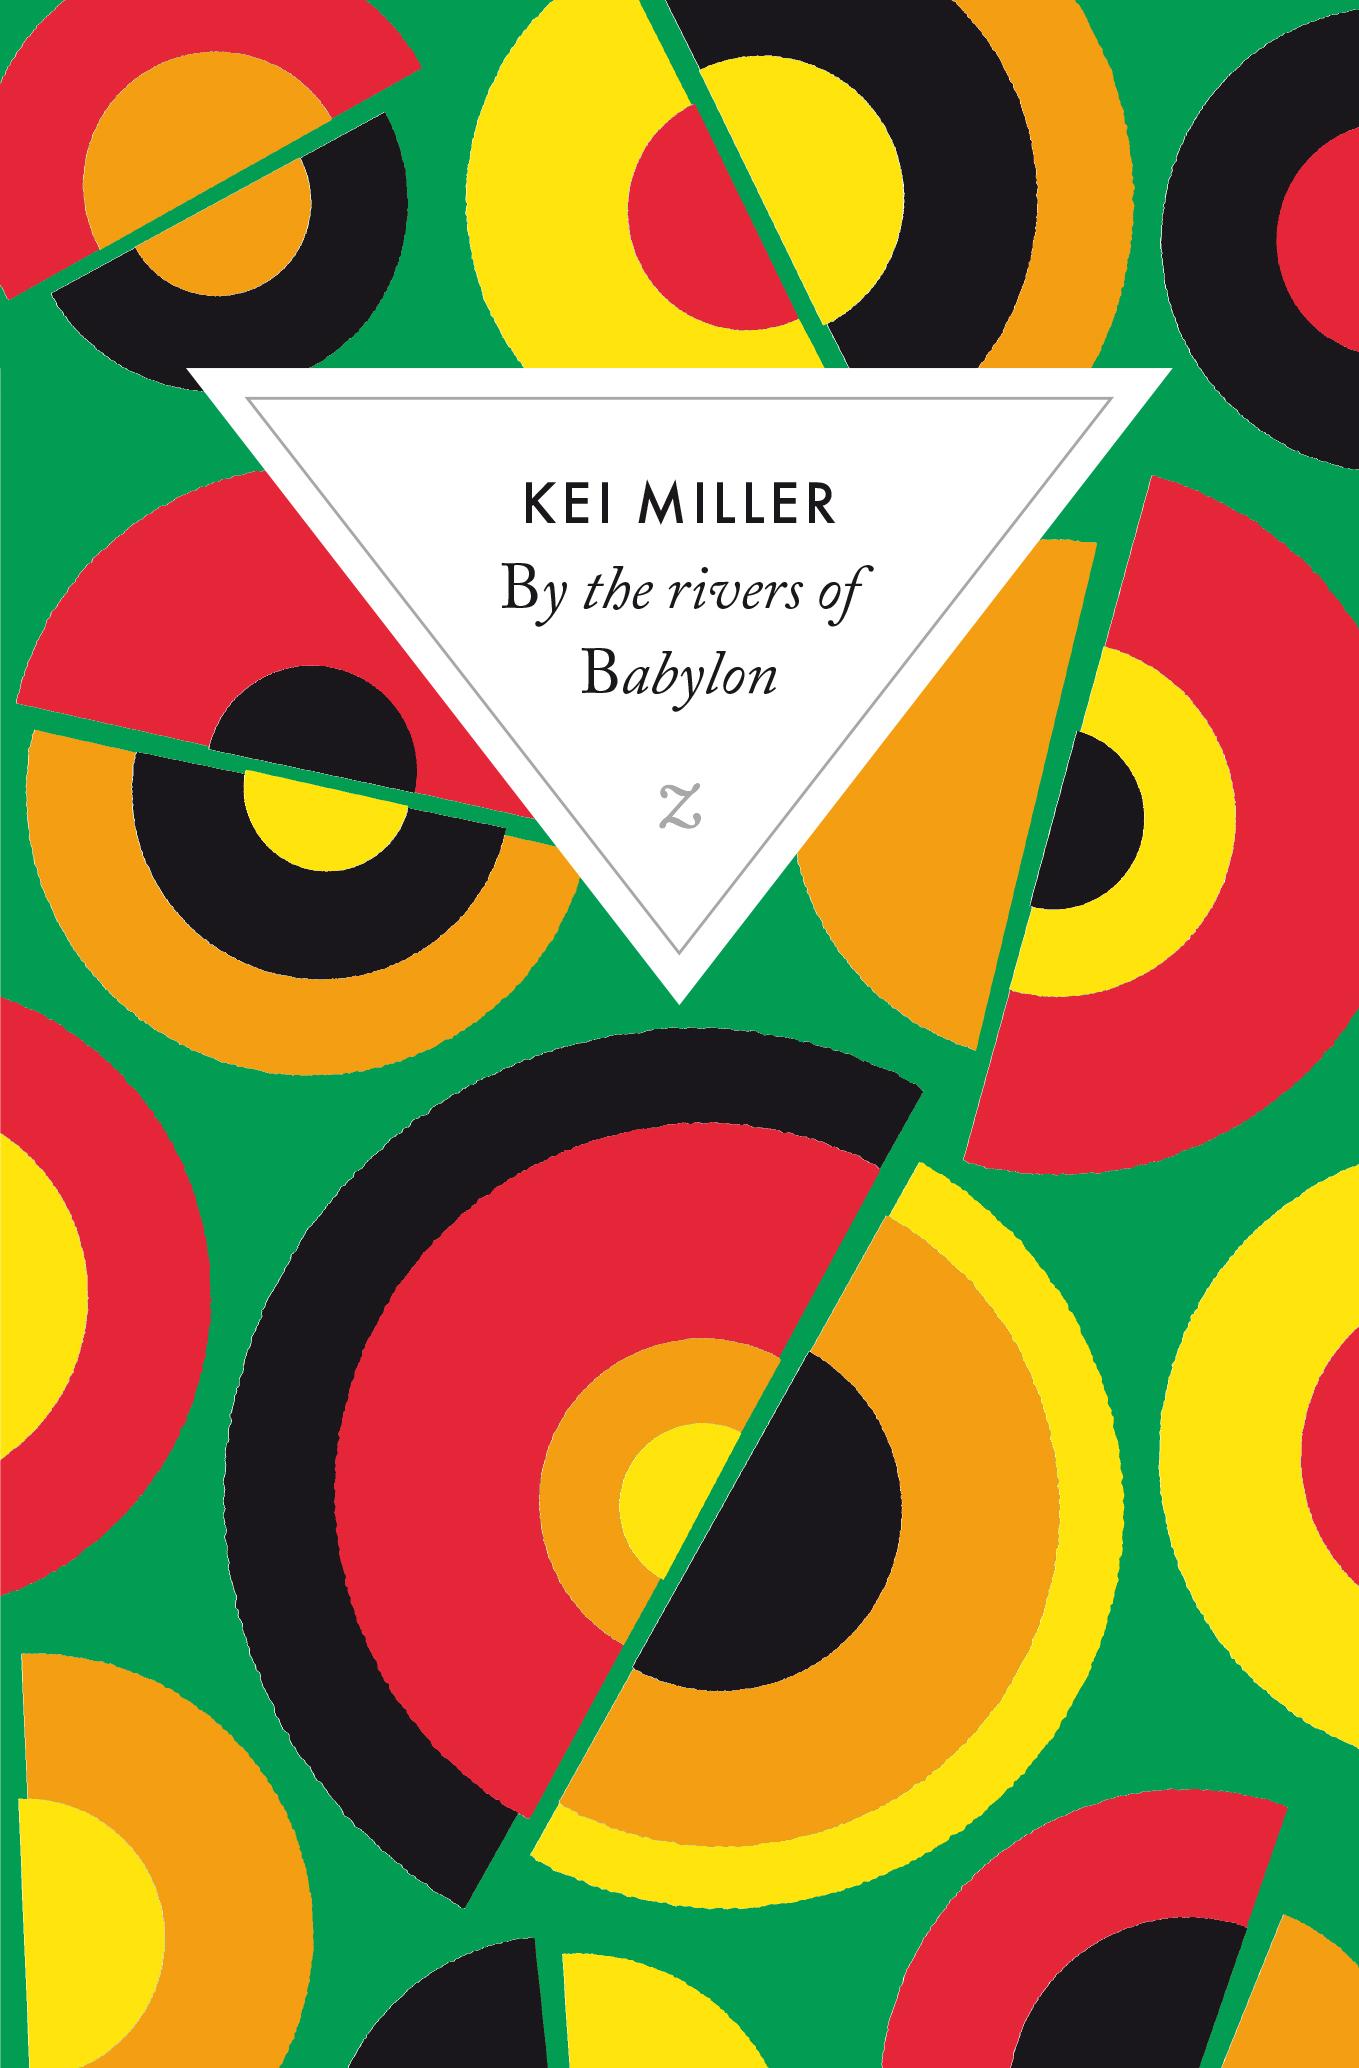 Couverture du livre By the rivers of Babylon